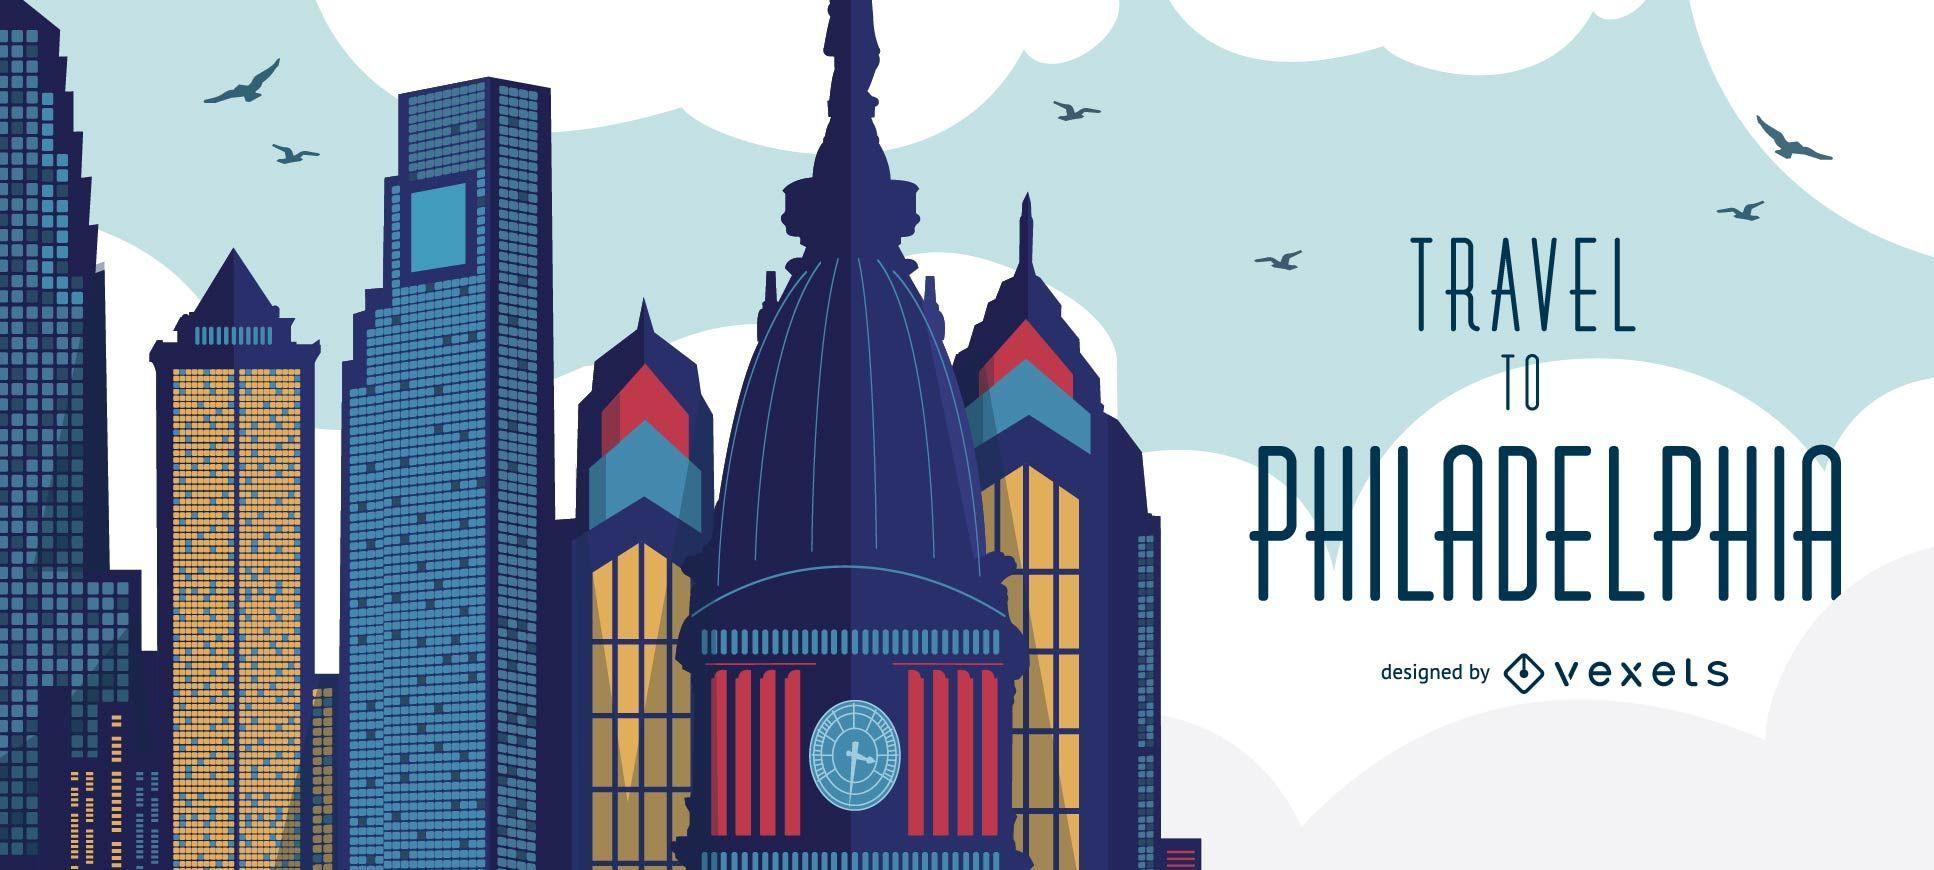 Viajar al horizonte de Filadelfia